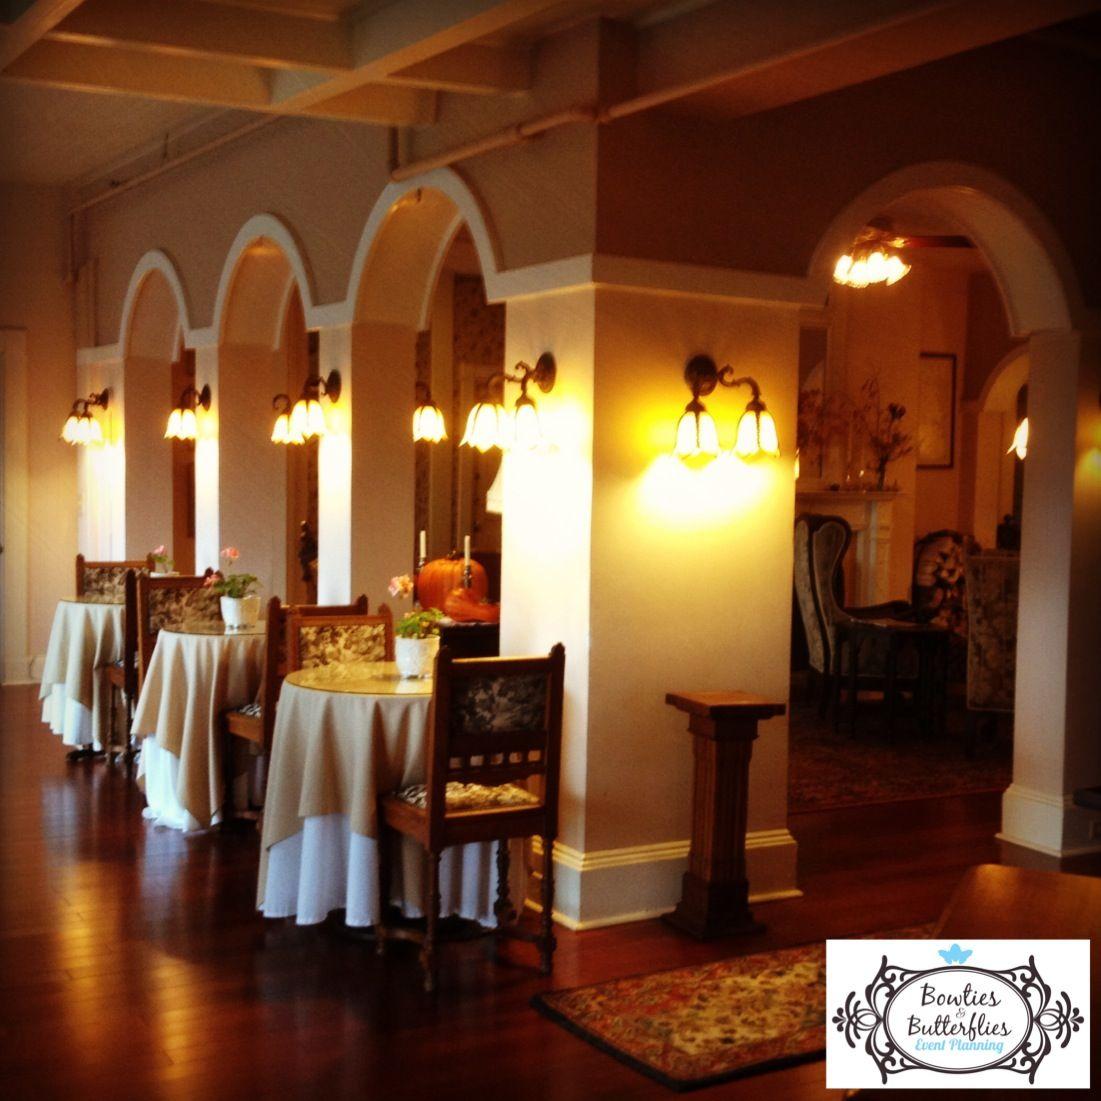 Winter Wedding Venues In Ma: Apple Tree Inn, Lenox MA